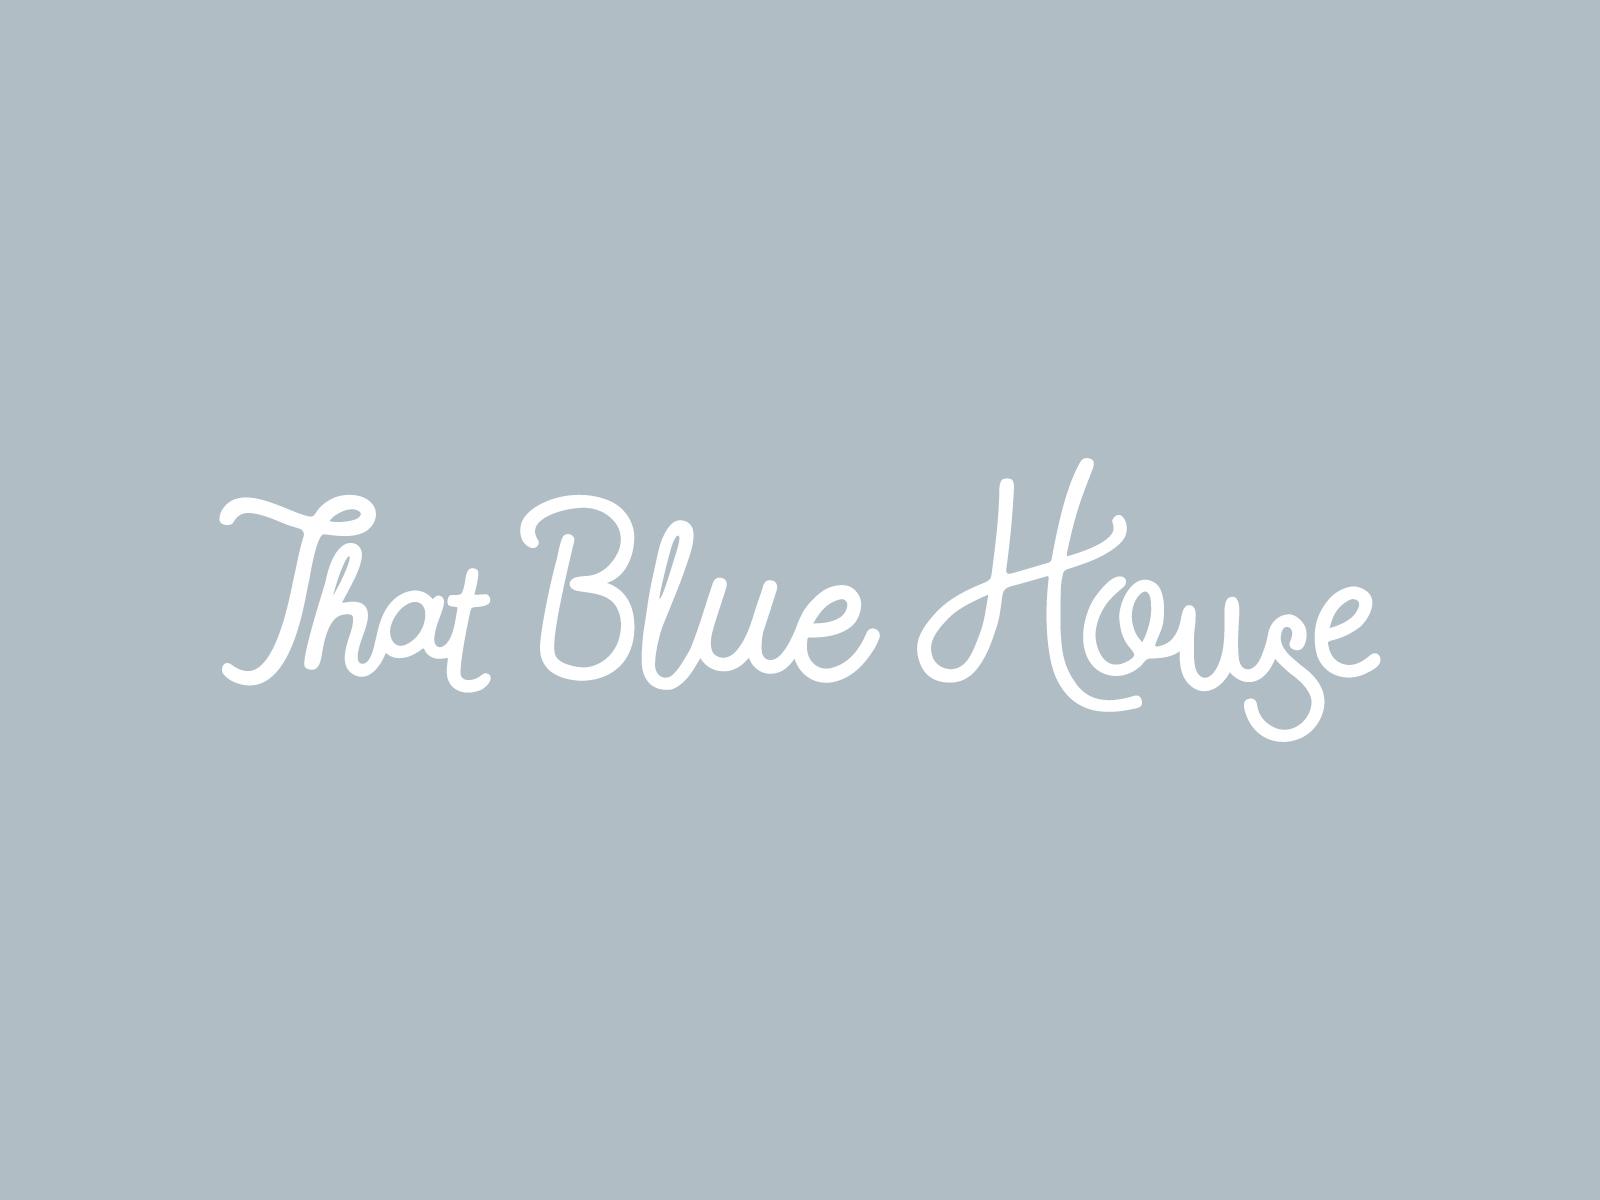 thatbluehouse-project-web3.jpg